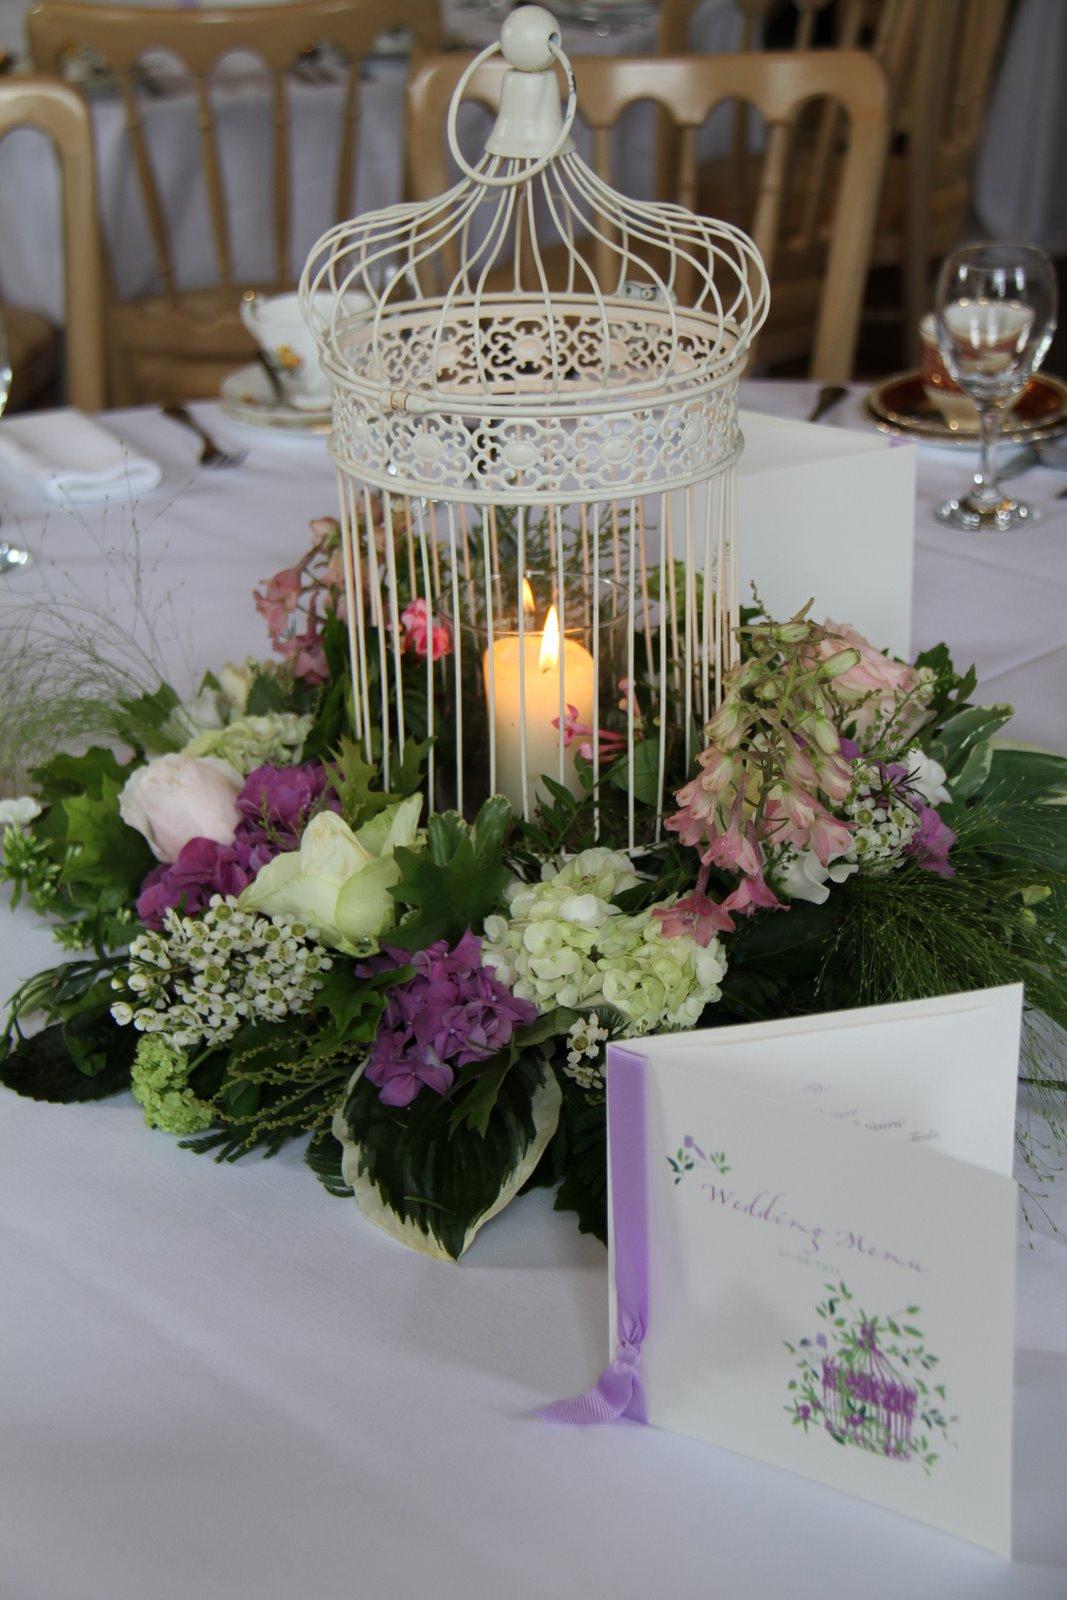 flower design table centrepieces vintage bird cage table centrepiece. Black Bedroom Furniture Sets. Home Design Ideas